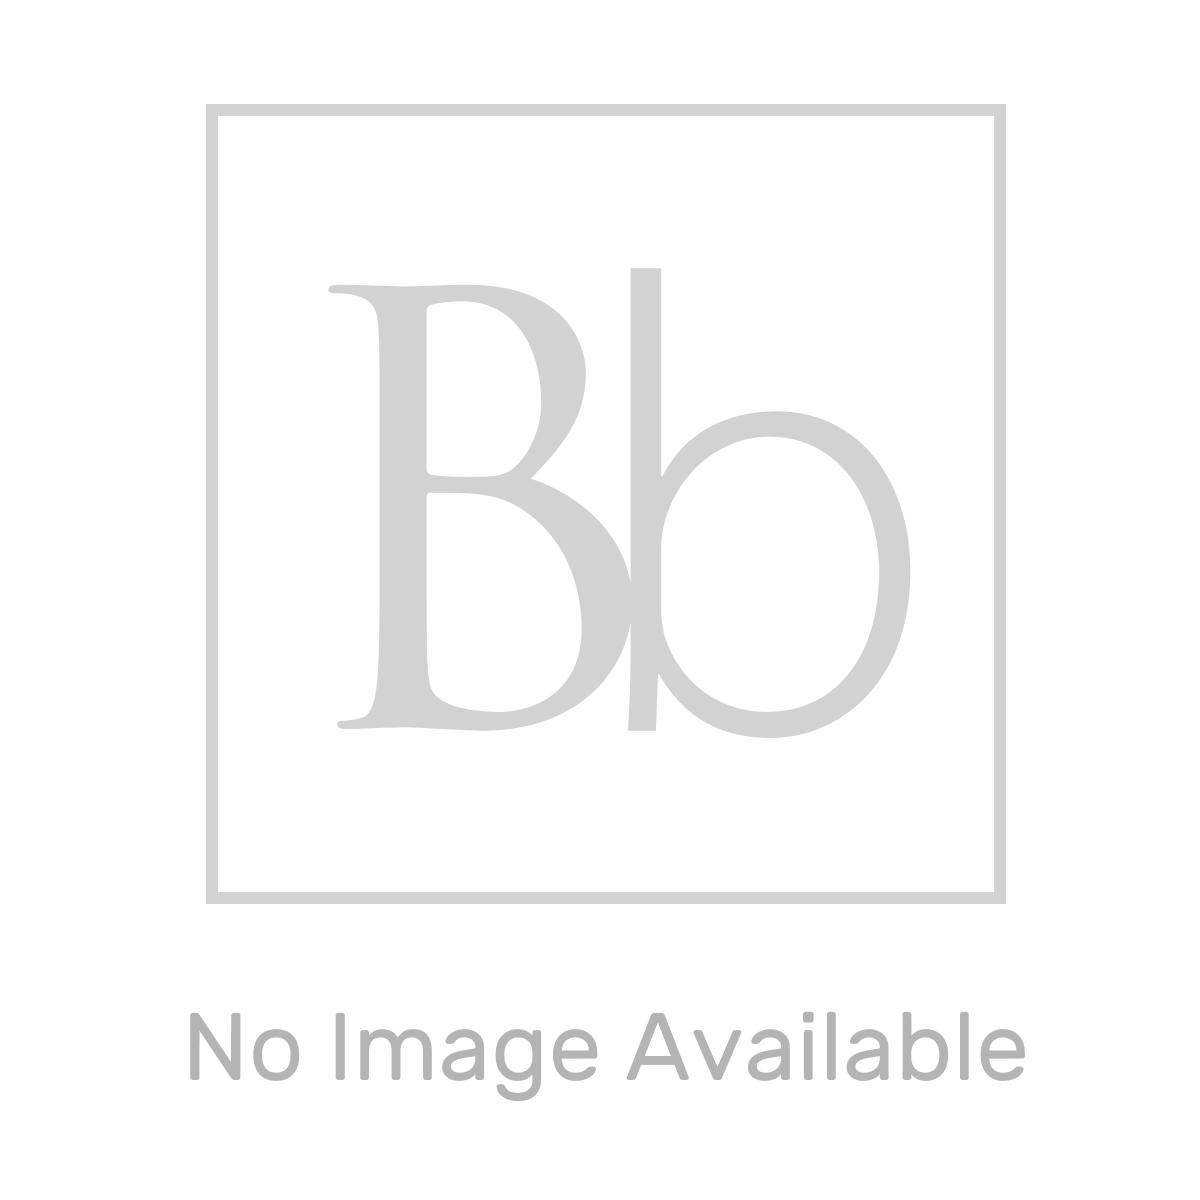 Aquadart Venturi 6 4 Fold Bath Shower Screen